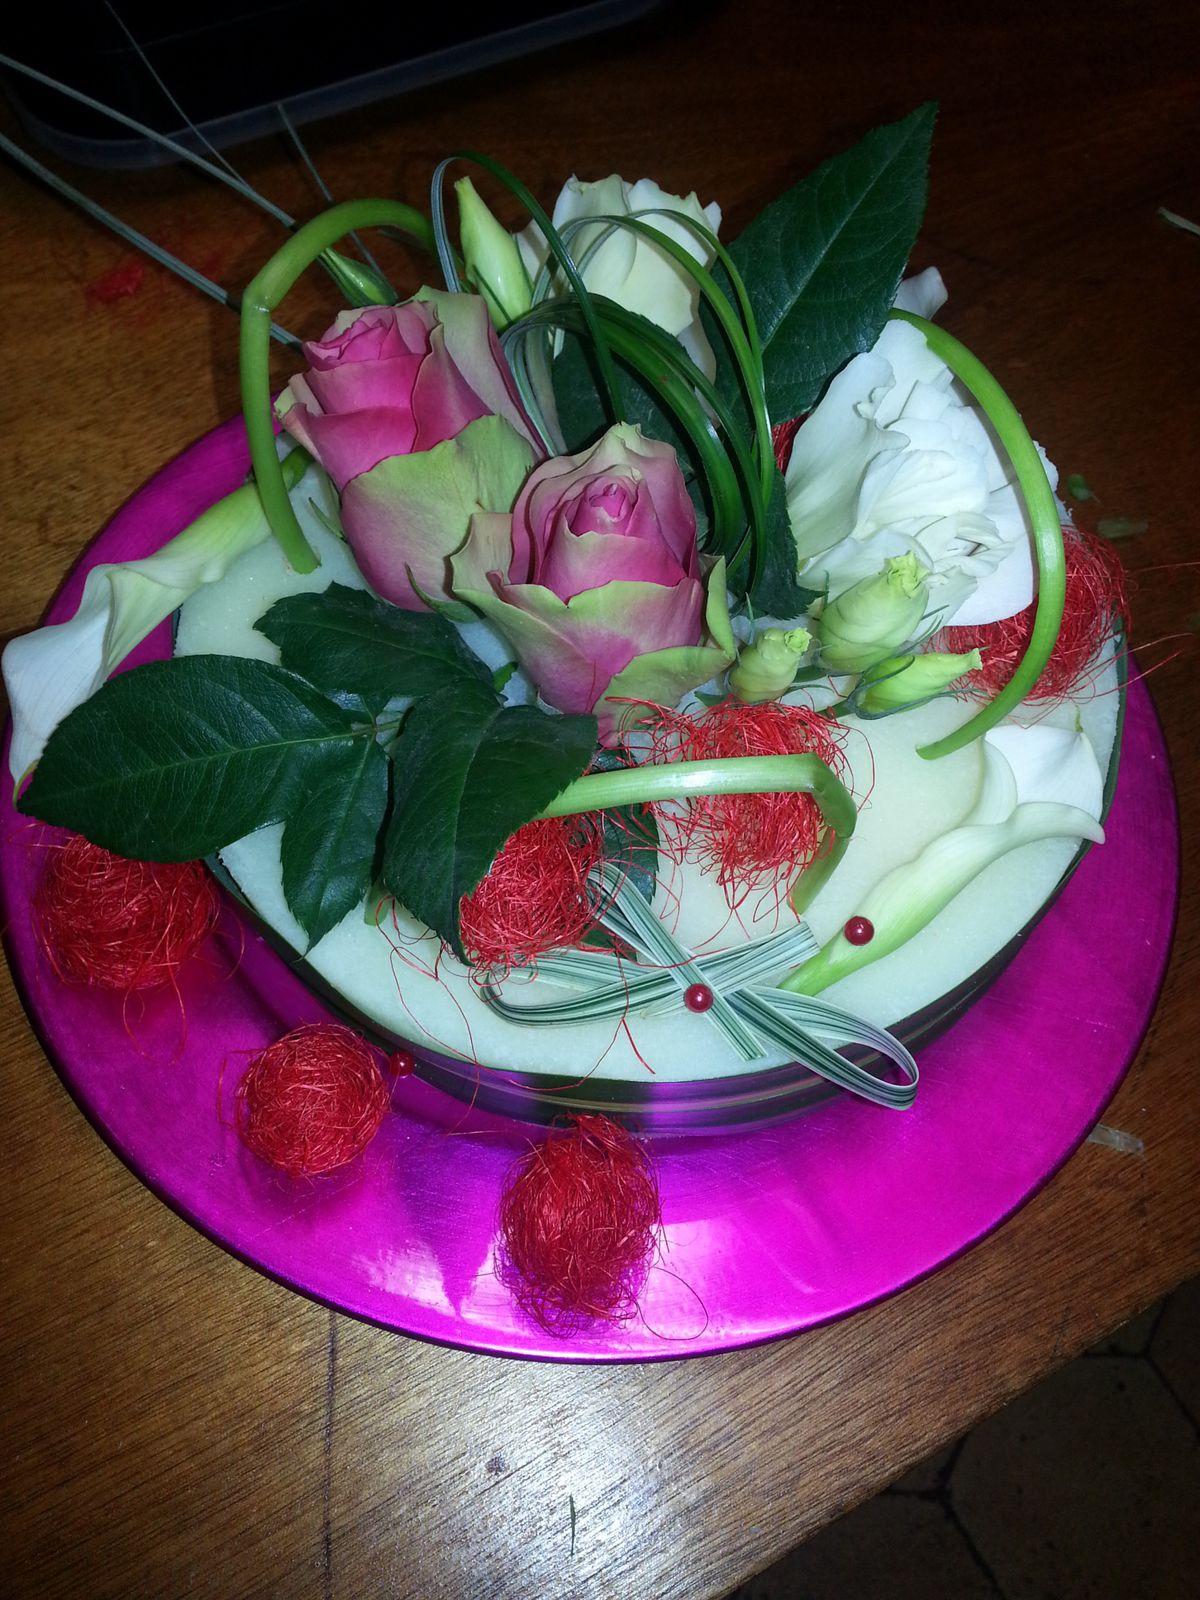 Activité fleur 2013 2014 - Le blog de foyer-rural-berdhuis b4aecda864e